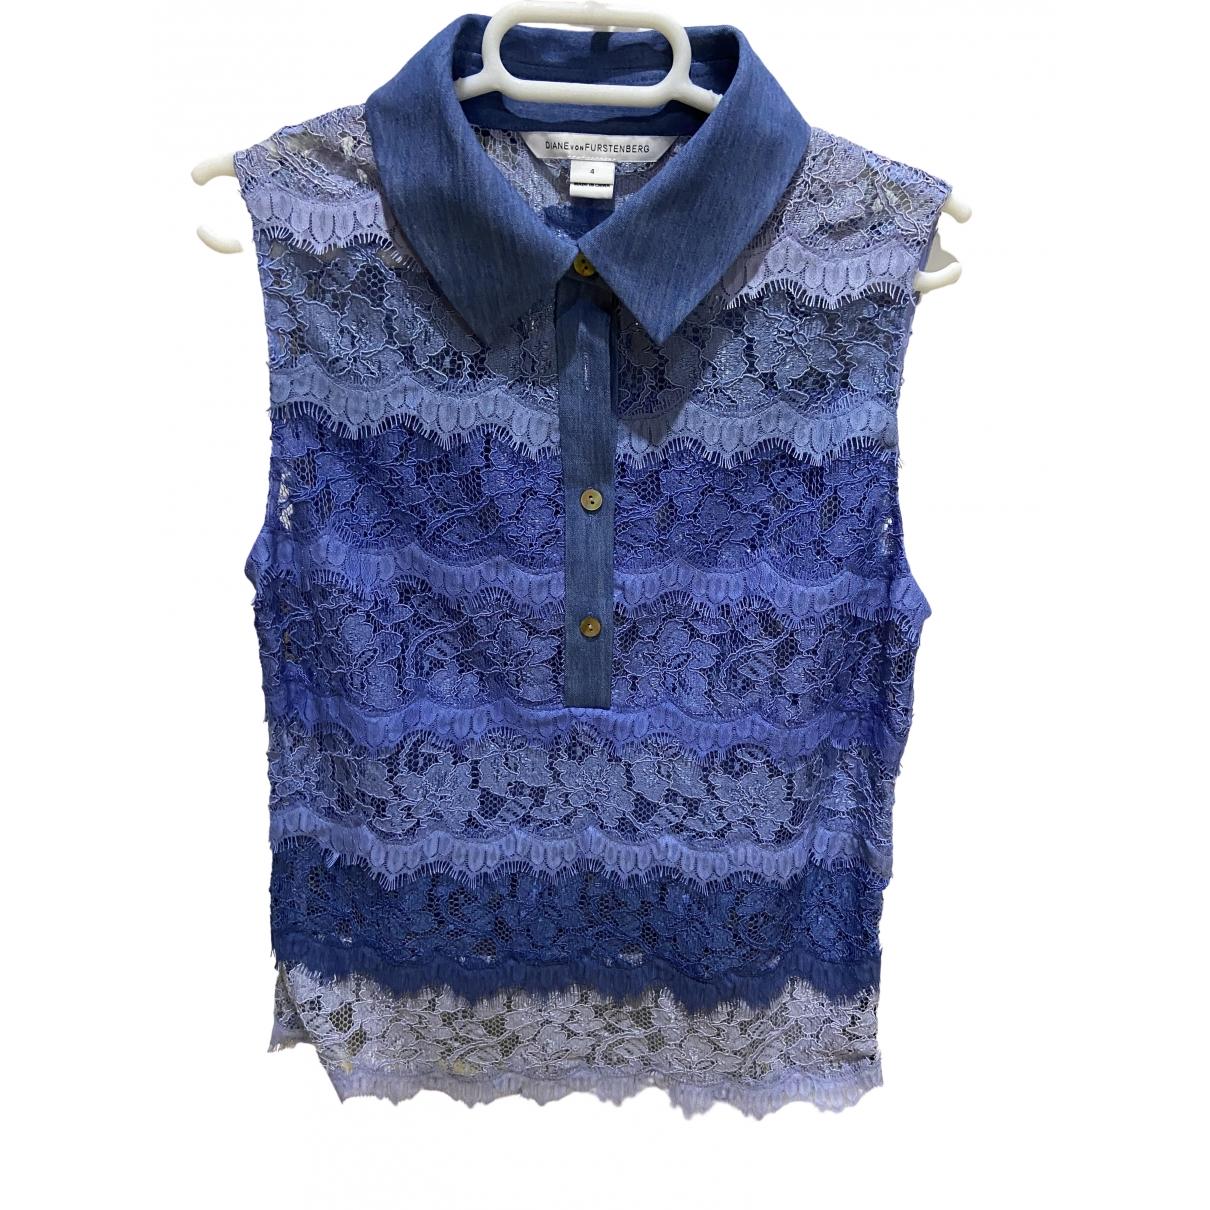 Diane Von Furstenberg - Top   pour femme en dentelle - bleu